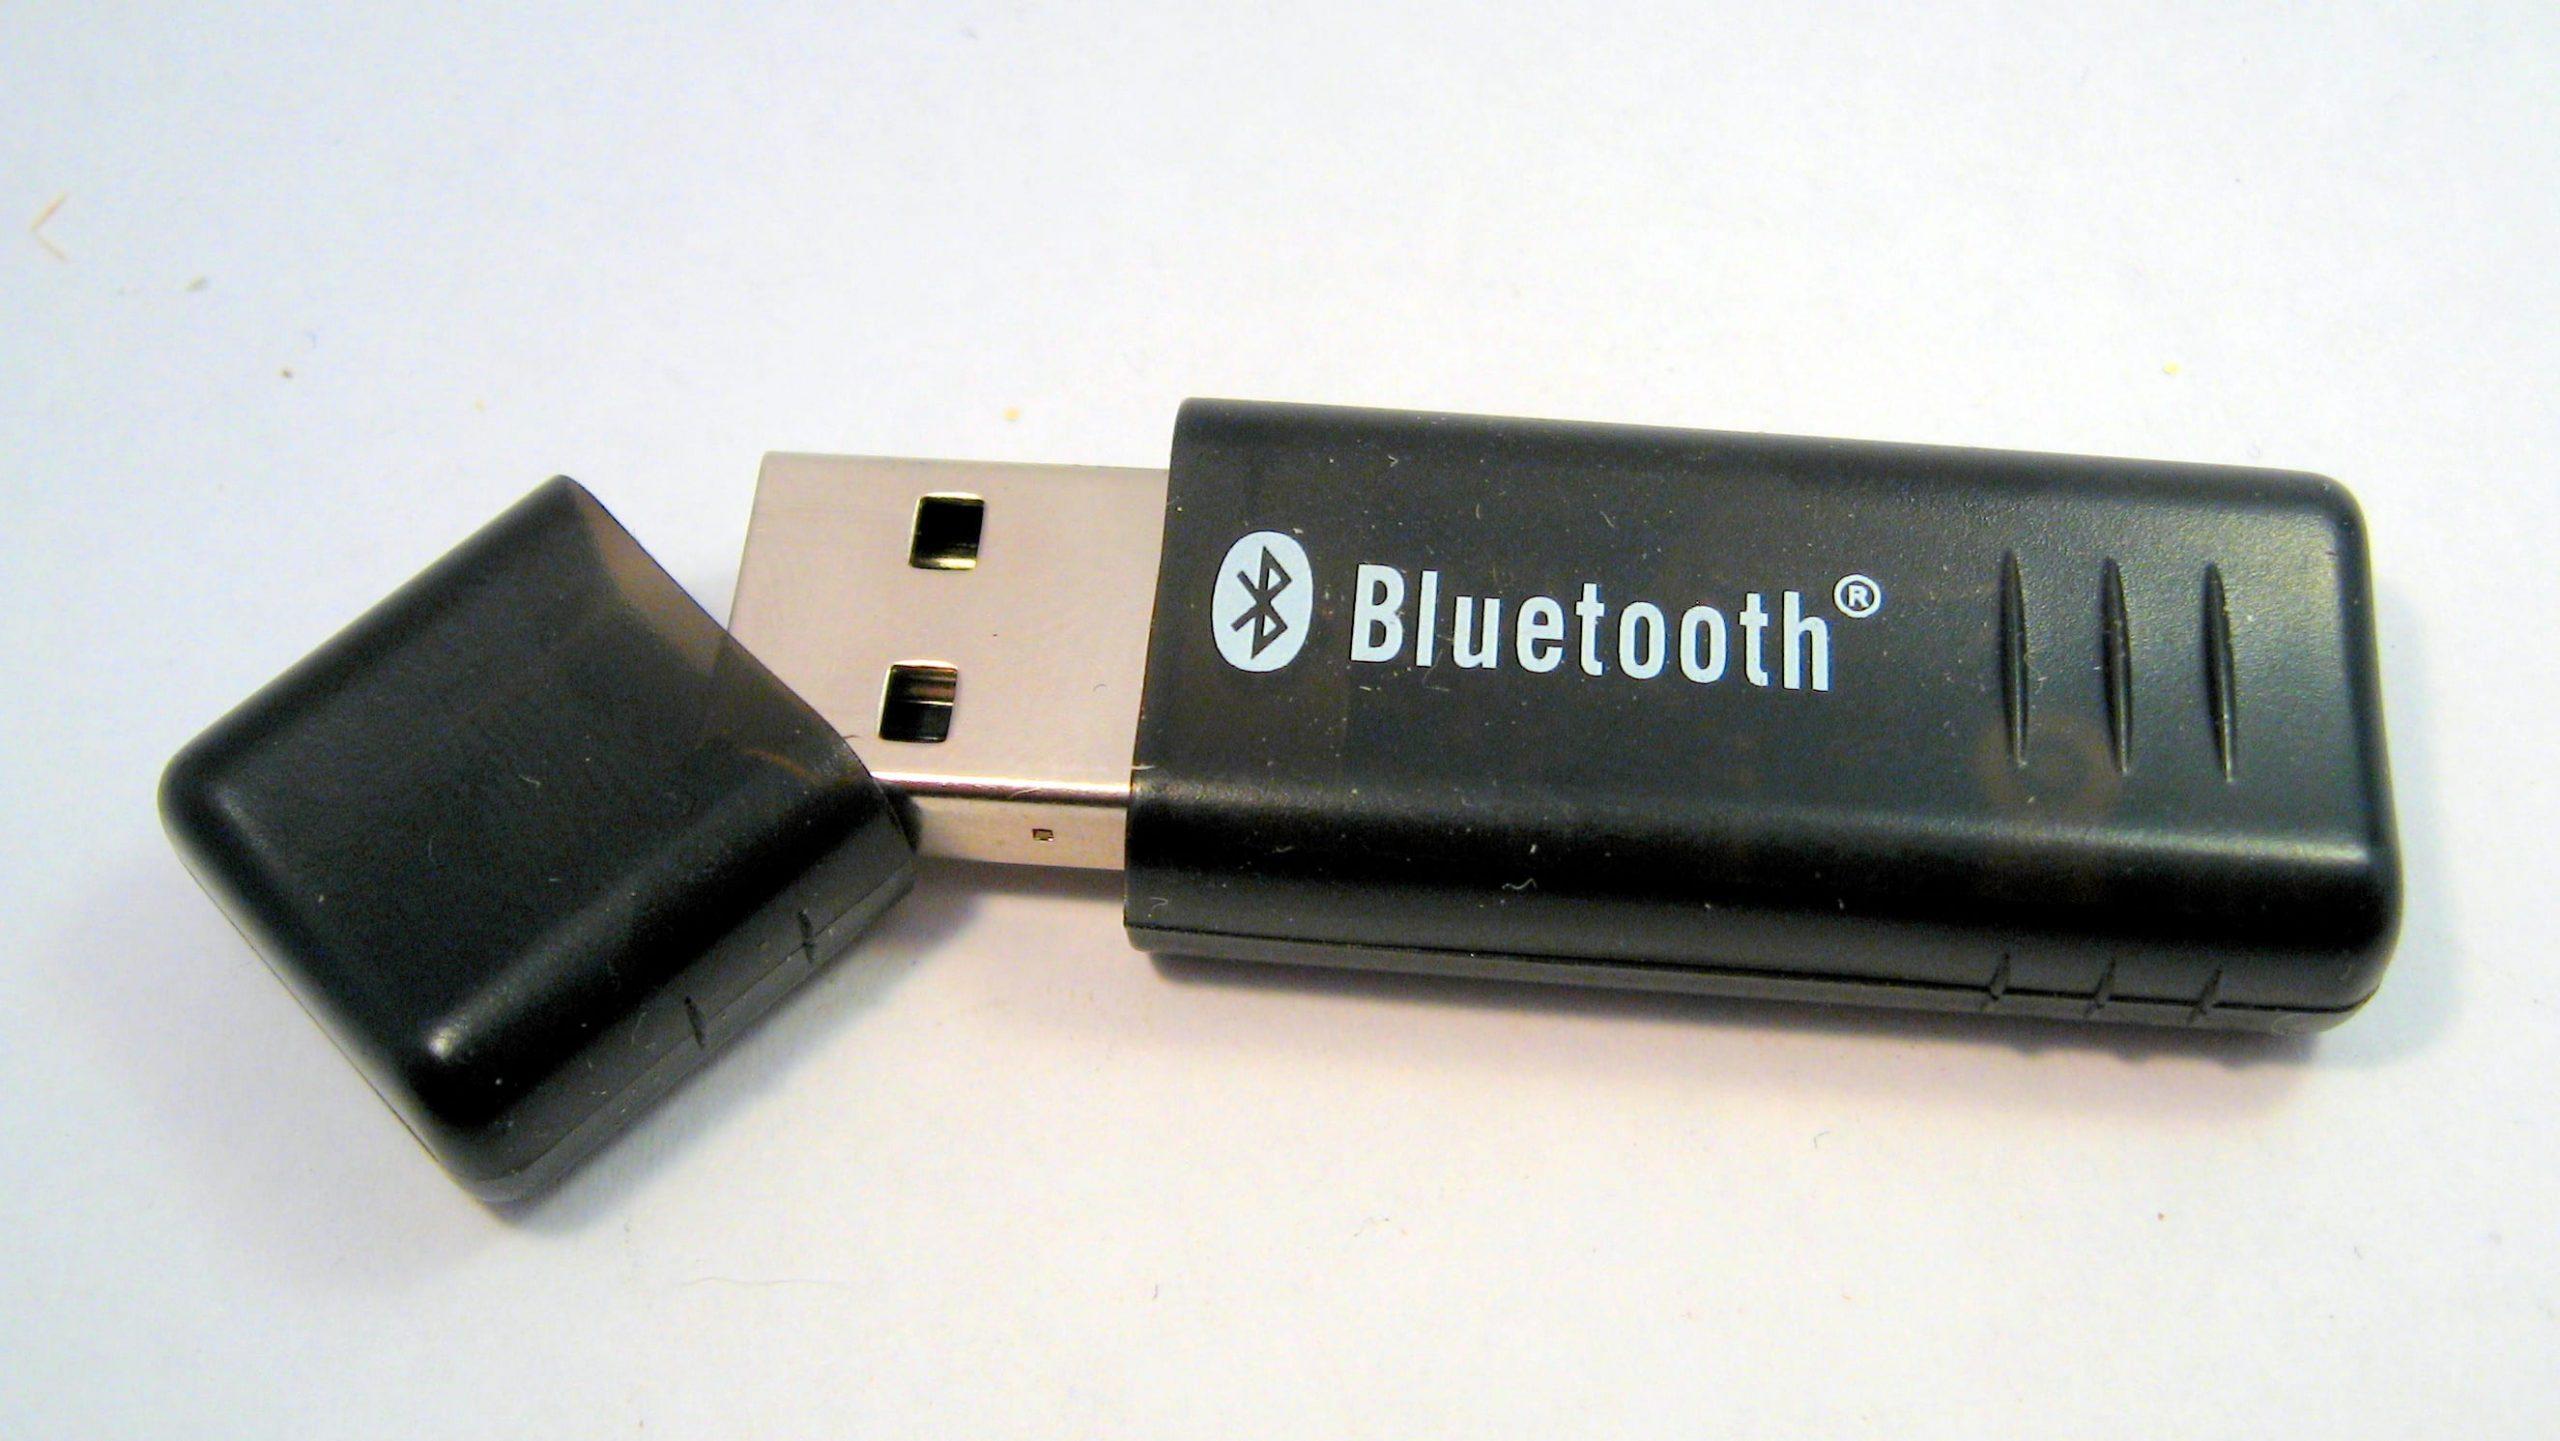 Bluetooth_dongle_ubt_236